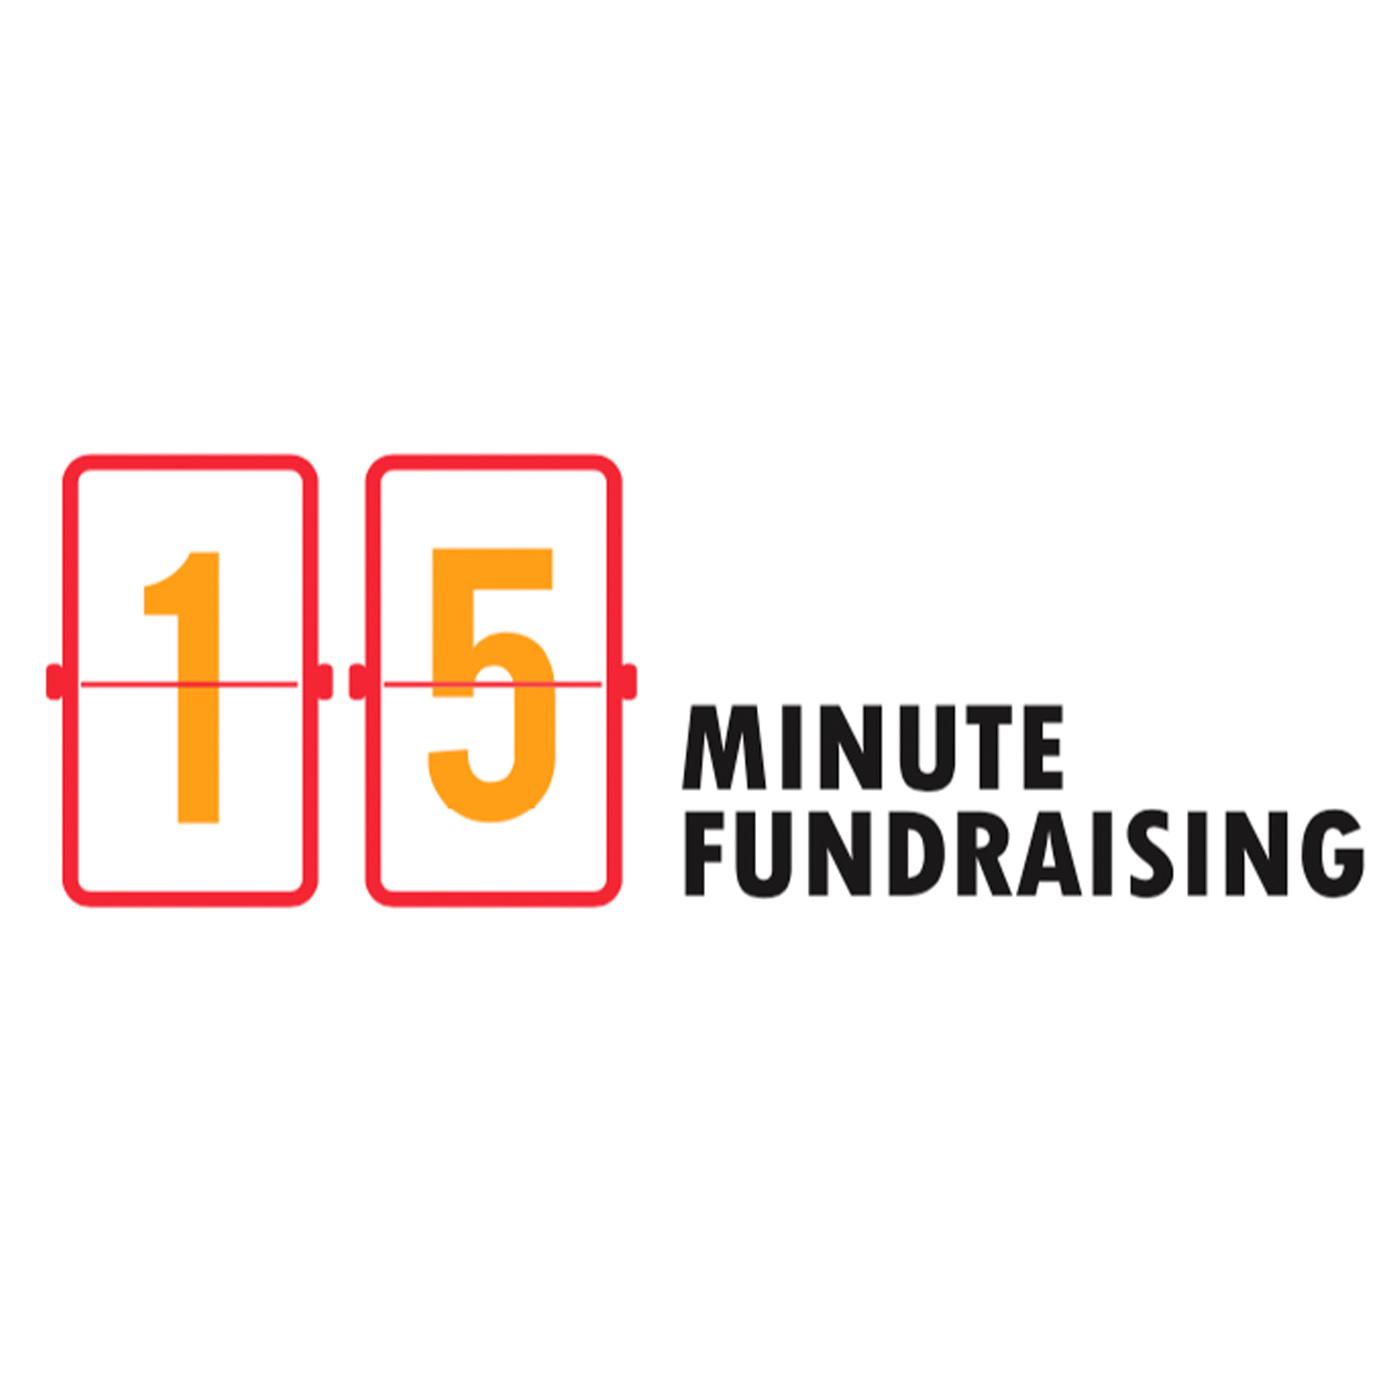 15 Minute Fundraising show art